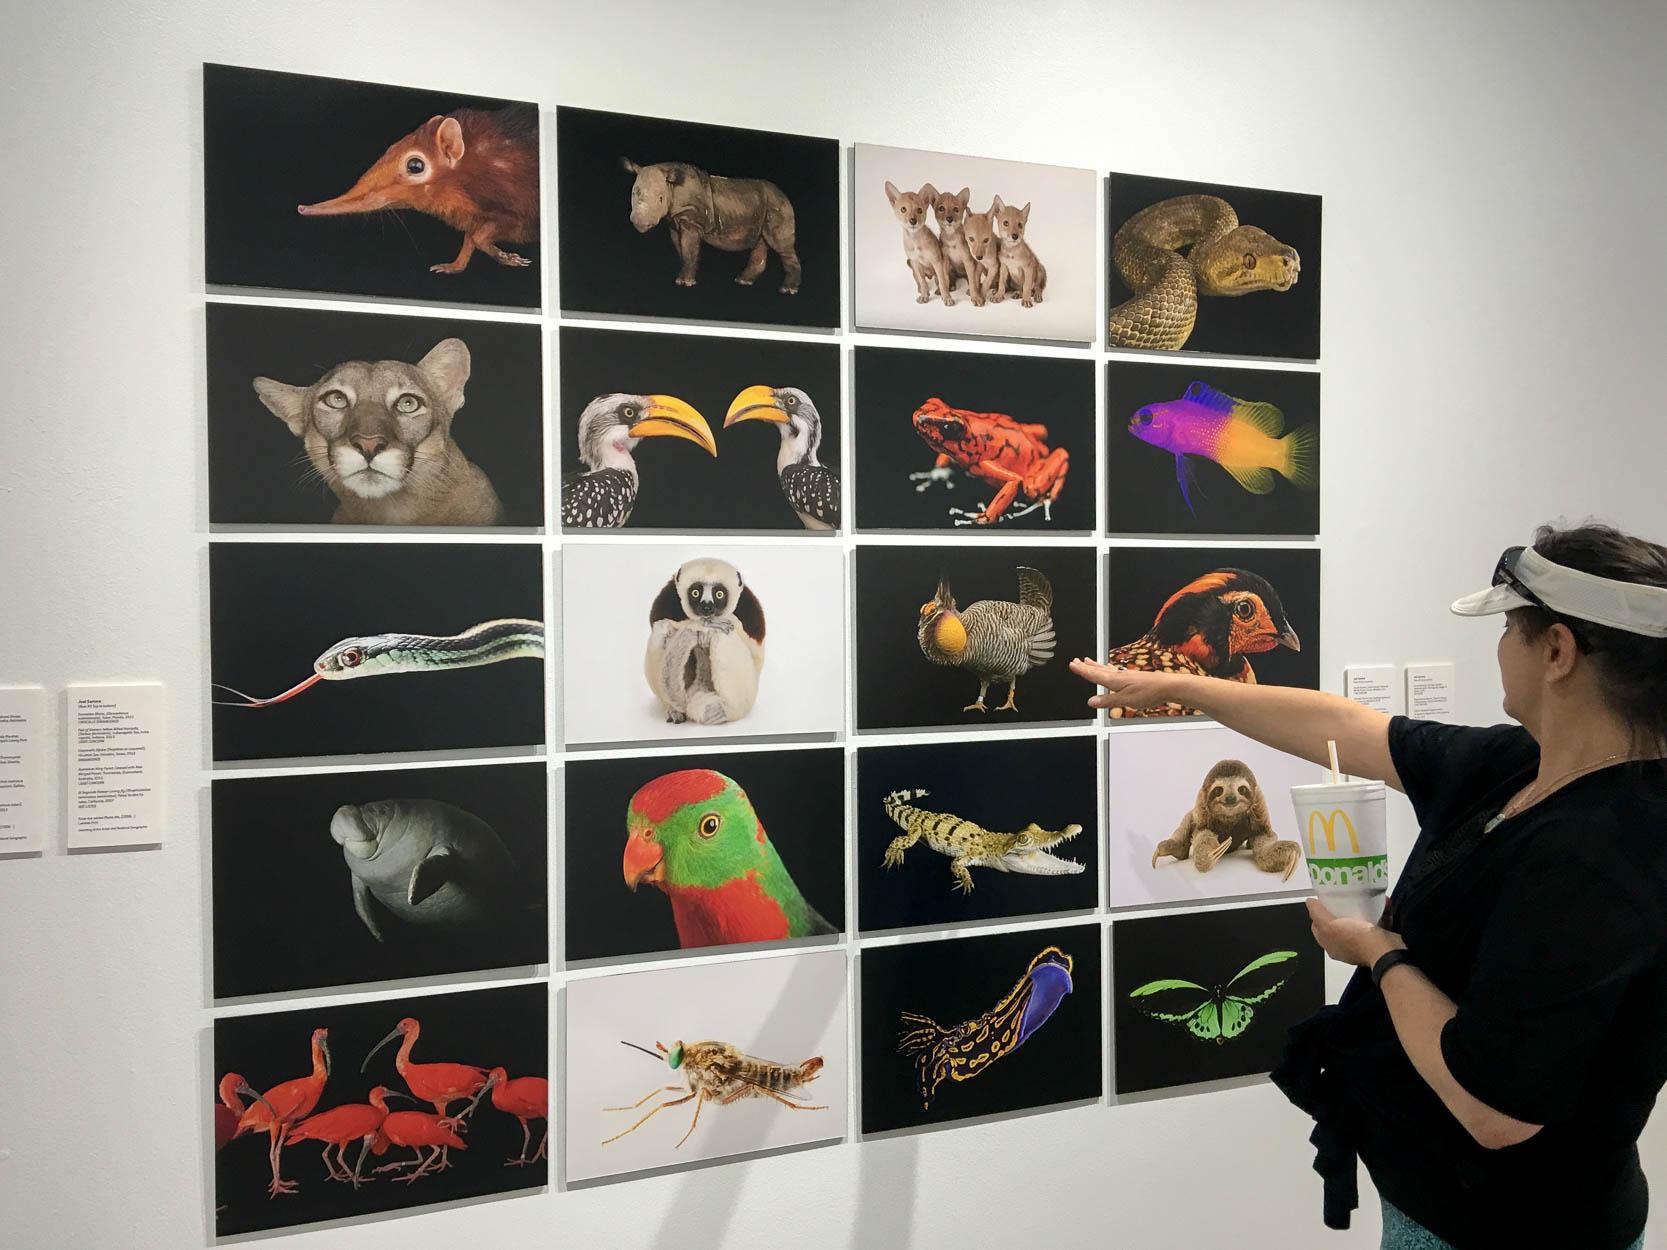 Joel Sartore's photos were exhibited at Spring Street Studios